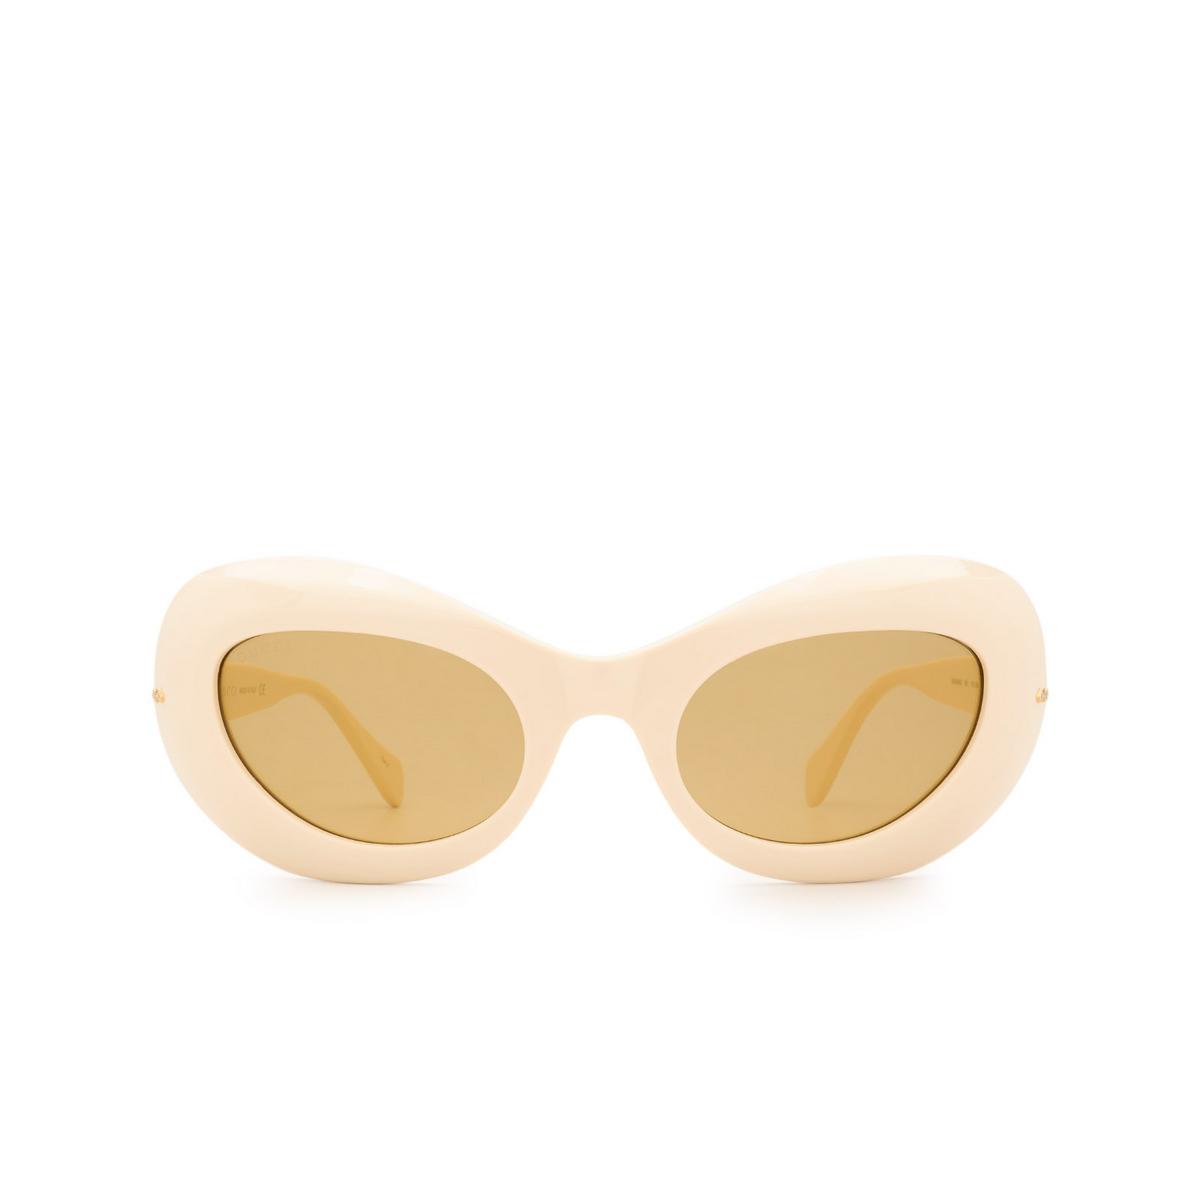 Gucci® Oval Sunglasses: GG0990S color White 001 - front view.